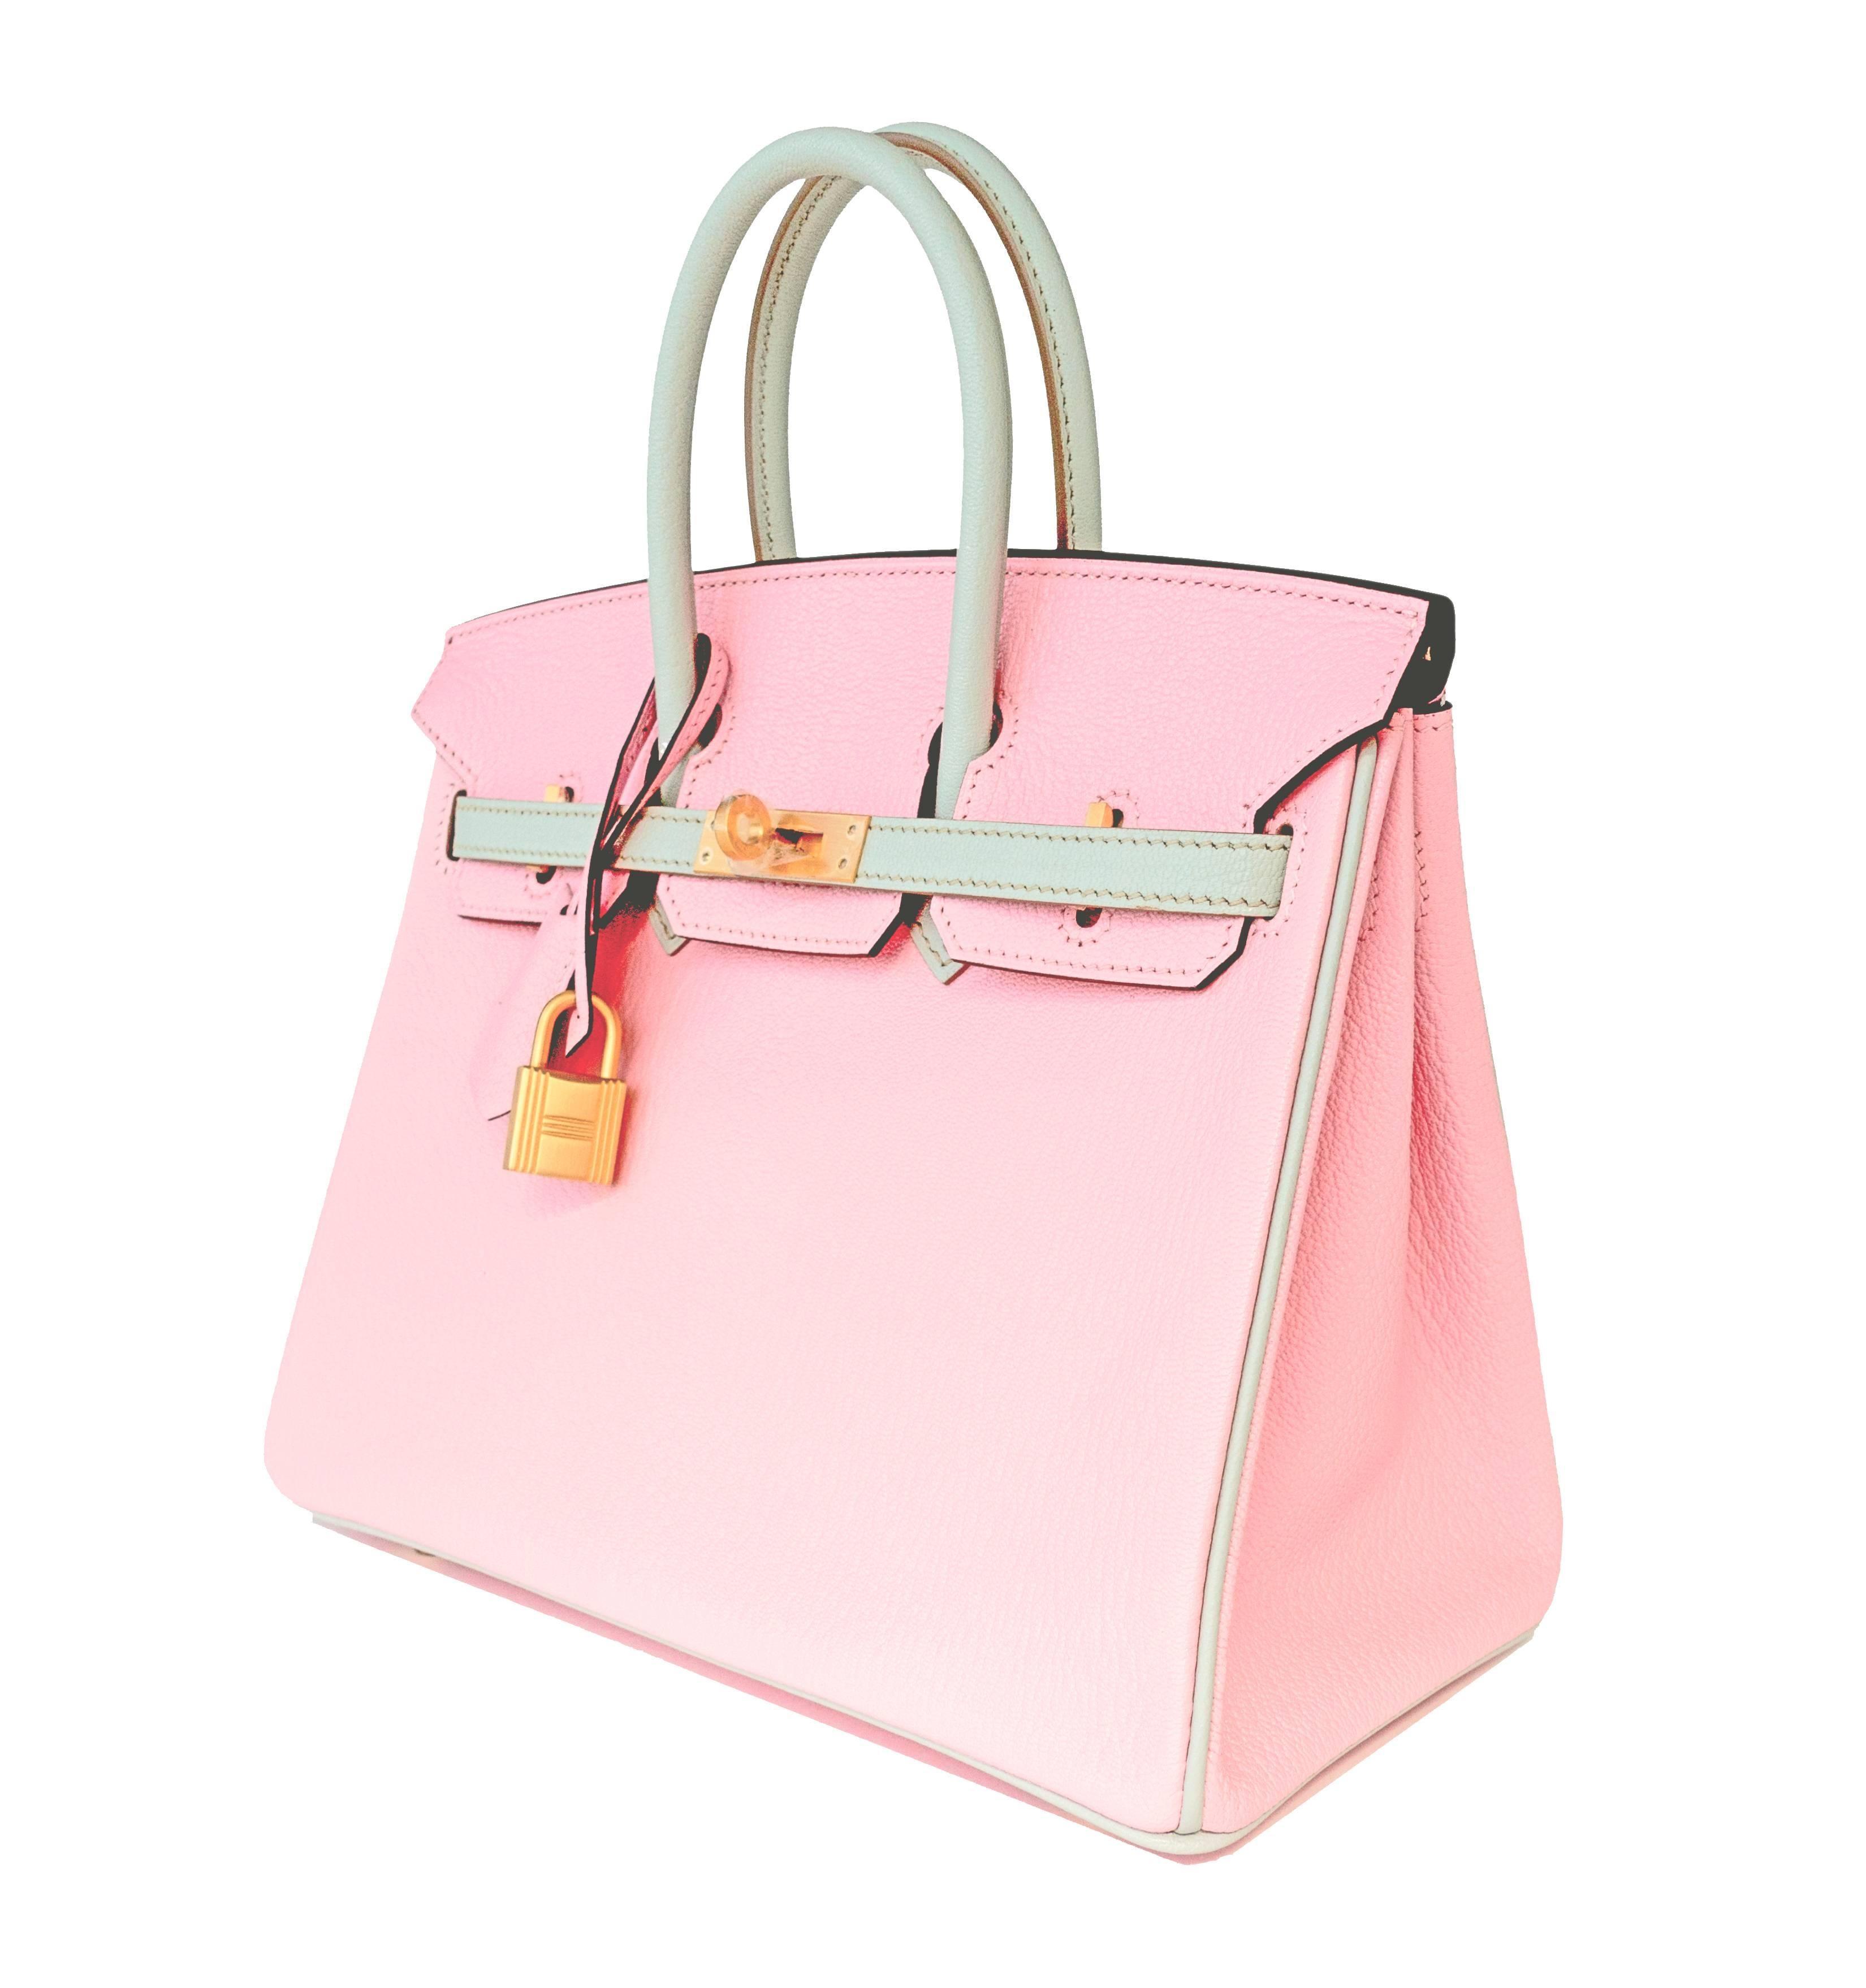 b98263724dd HSS Hermes Rose Sakura Gris Perle 25cm Chevre Birkin Special Order  Horseshoe VIP at 1stdibs